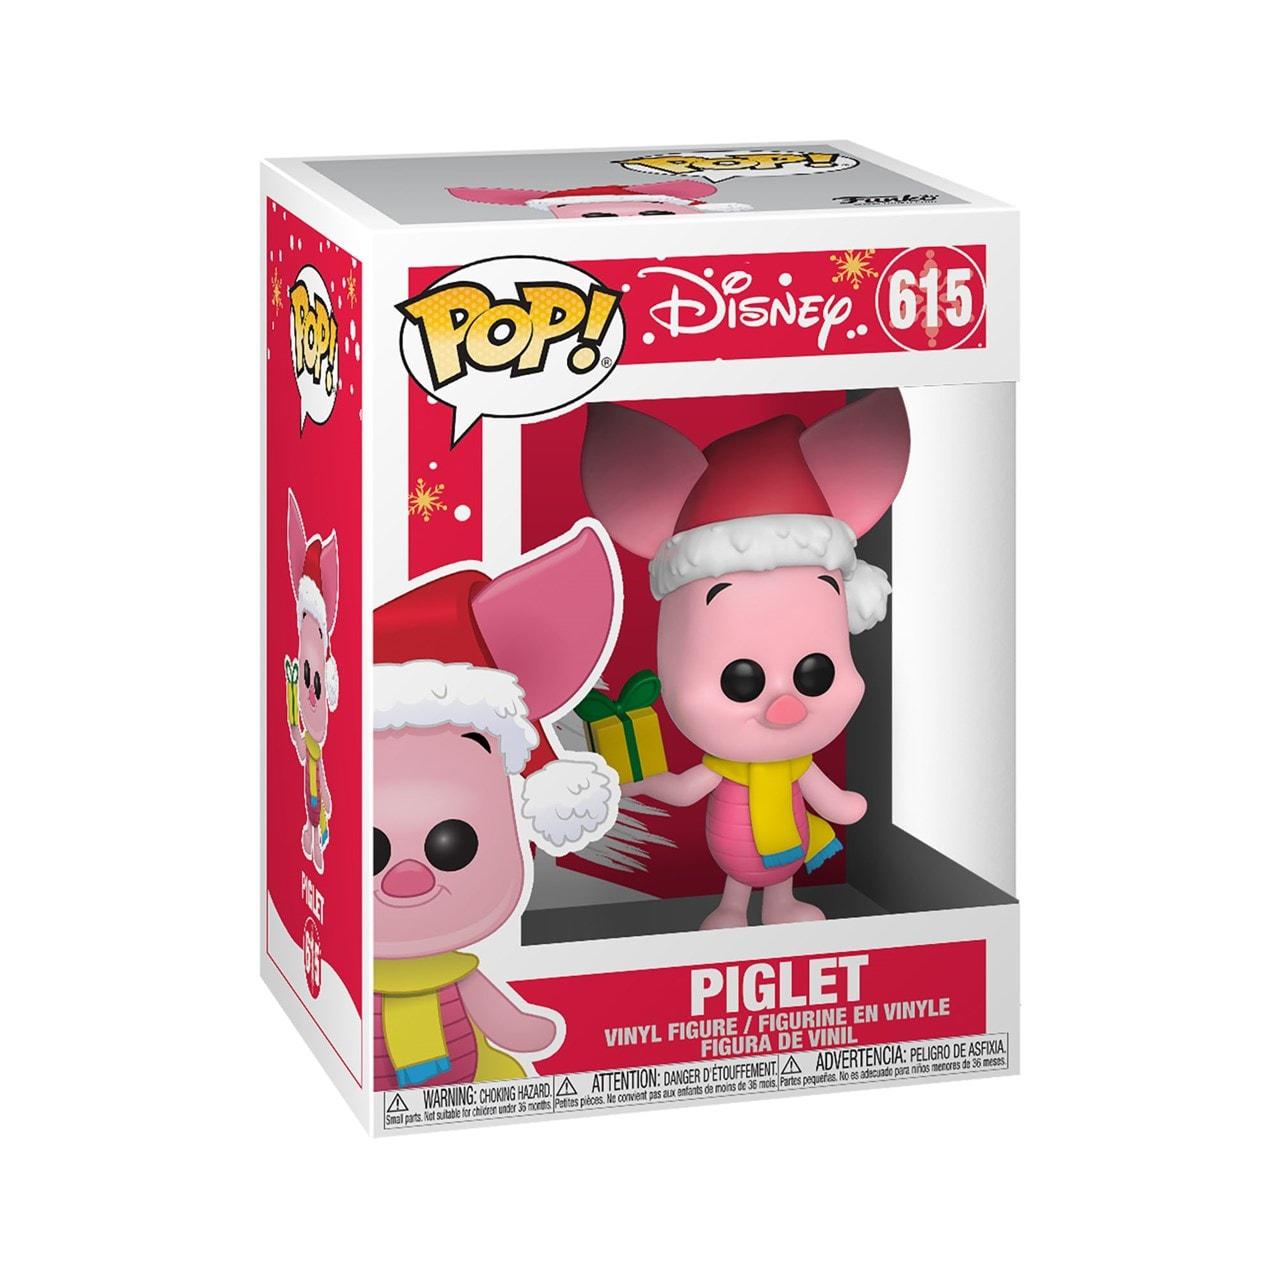 Holiday Piglet (615) Winnie The Pooh: Disney Pop Vinyl - 2